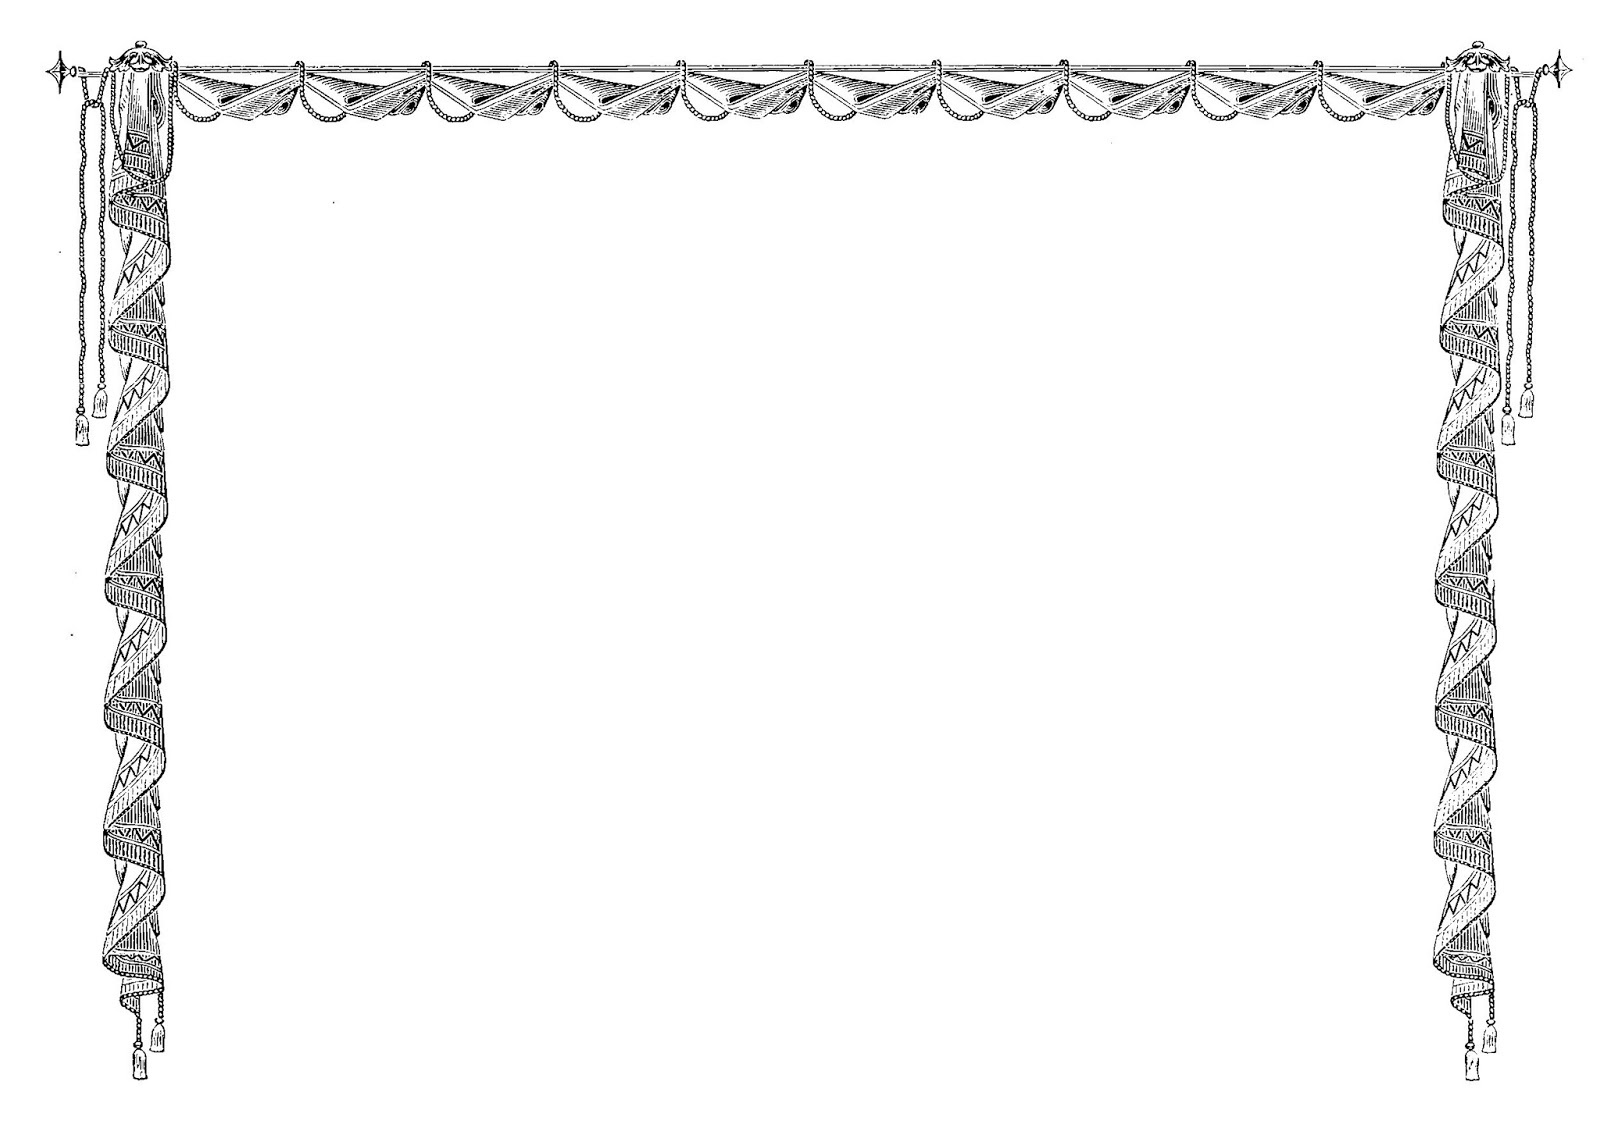 Digital Stamp Design: Royalty Free Printable Page Border Vintage - Free Printable Page Borders